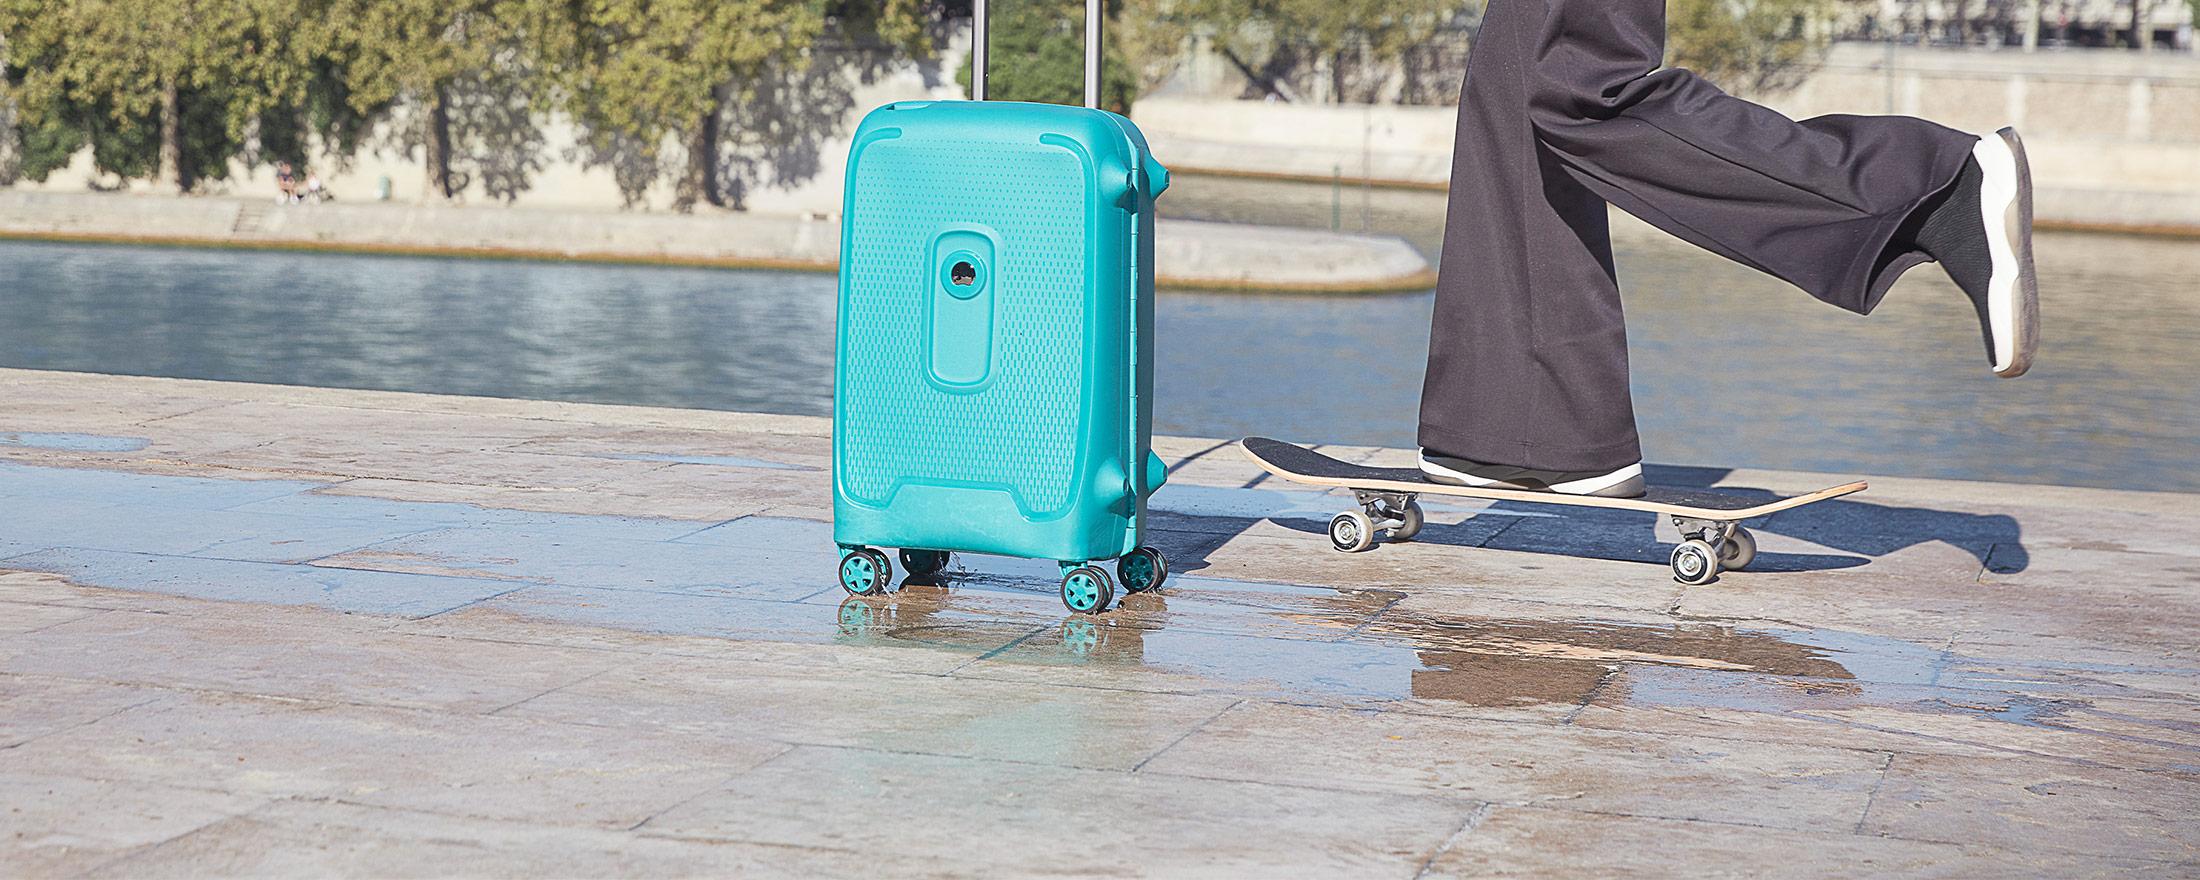 luggage and skateboard